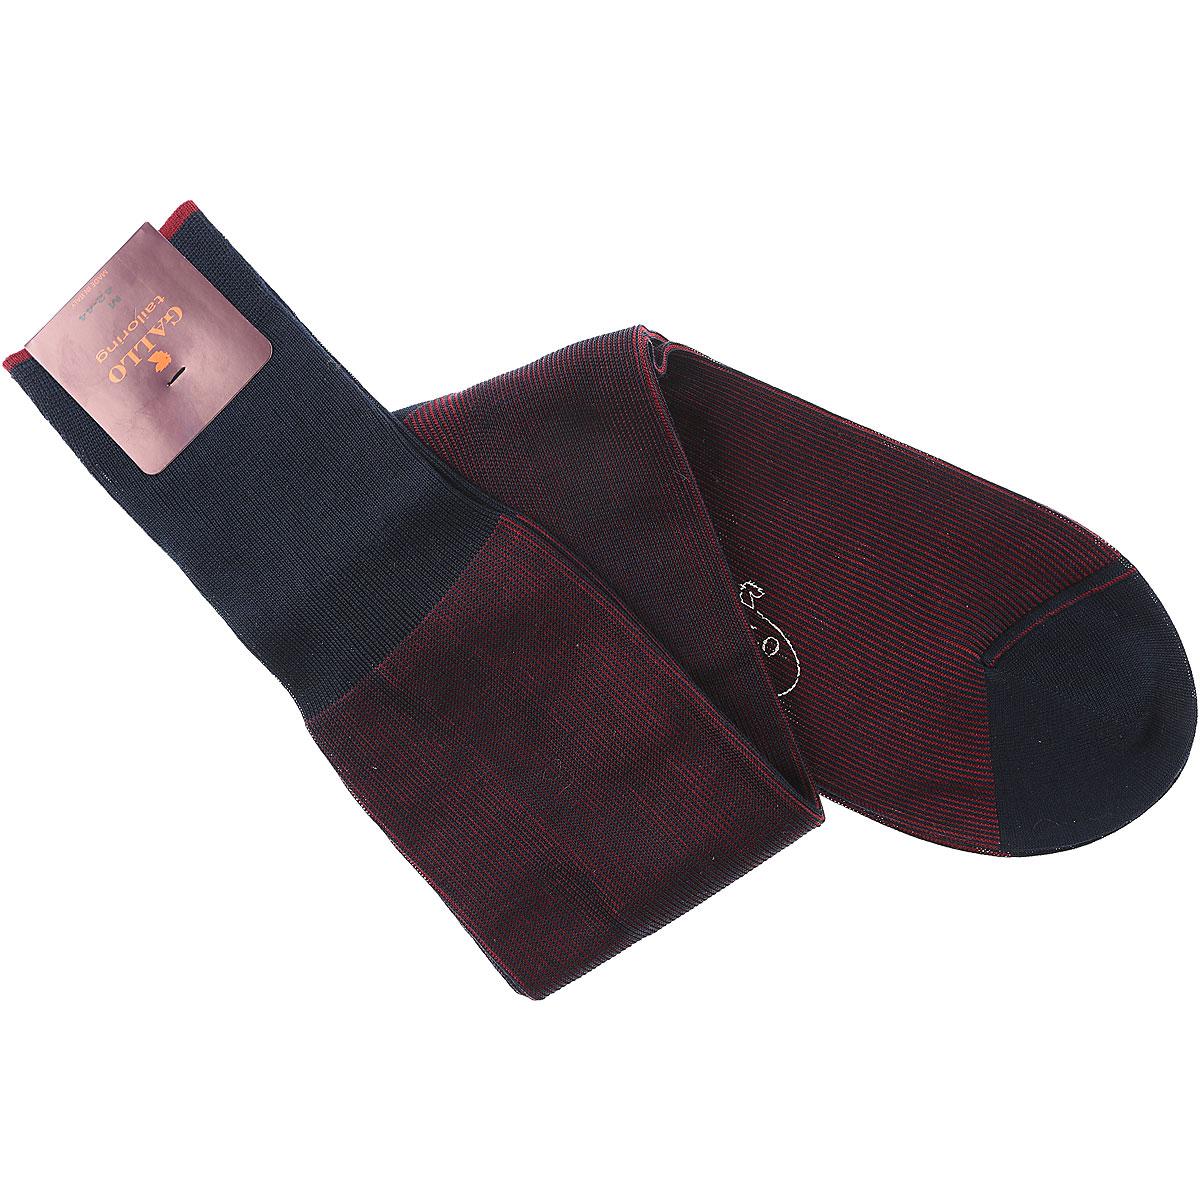 Gallo Socks Socks for Men, Sea Blue, Cotton, 2017, S M L USA-454693